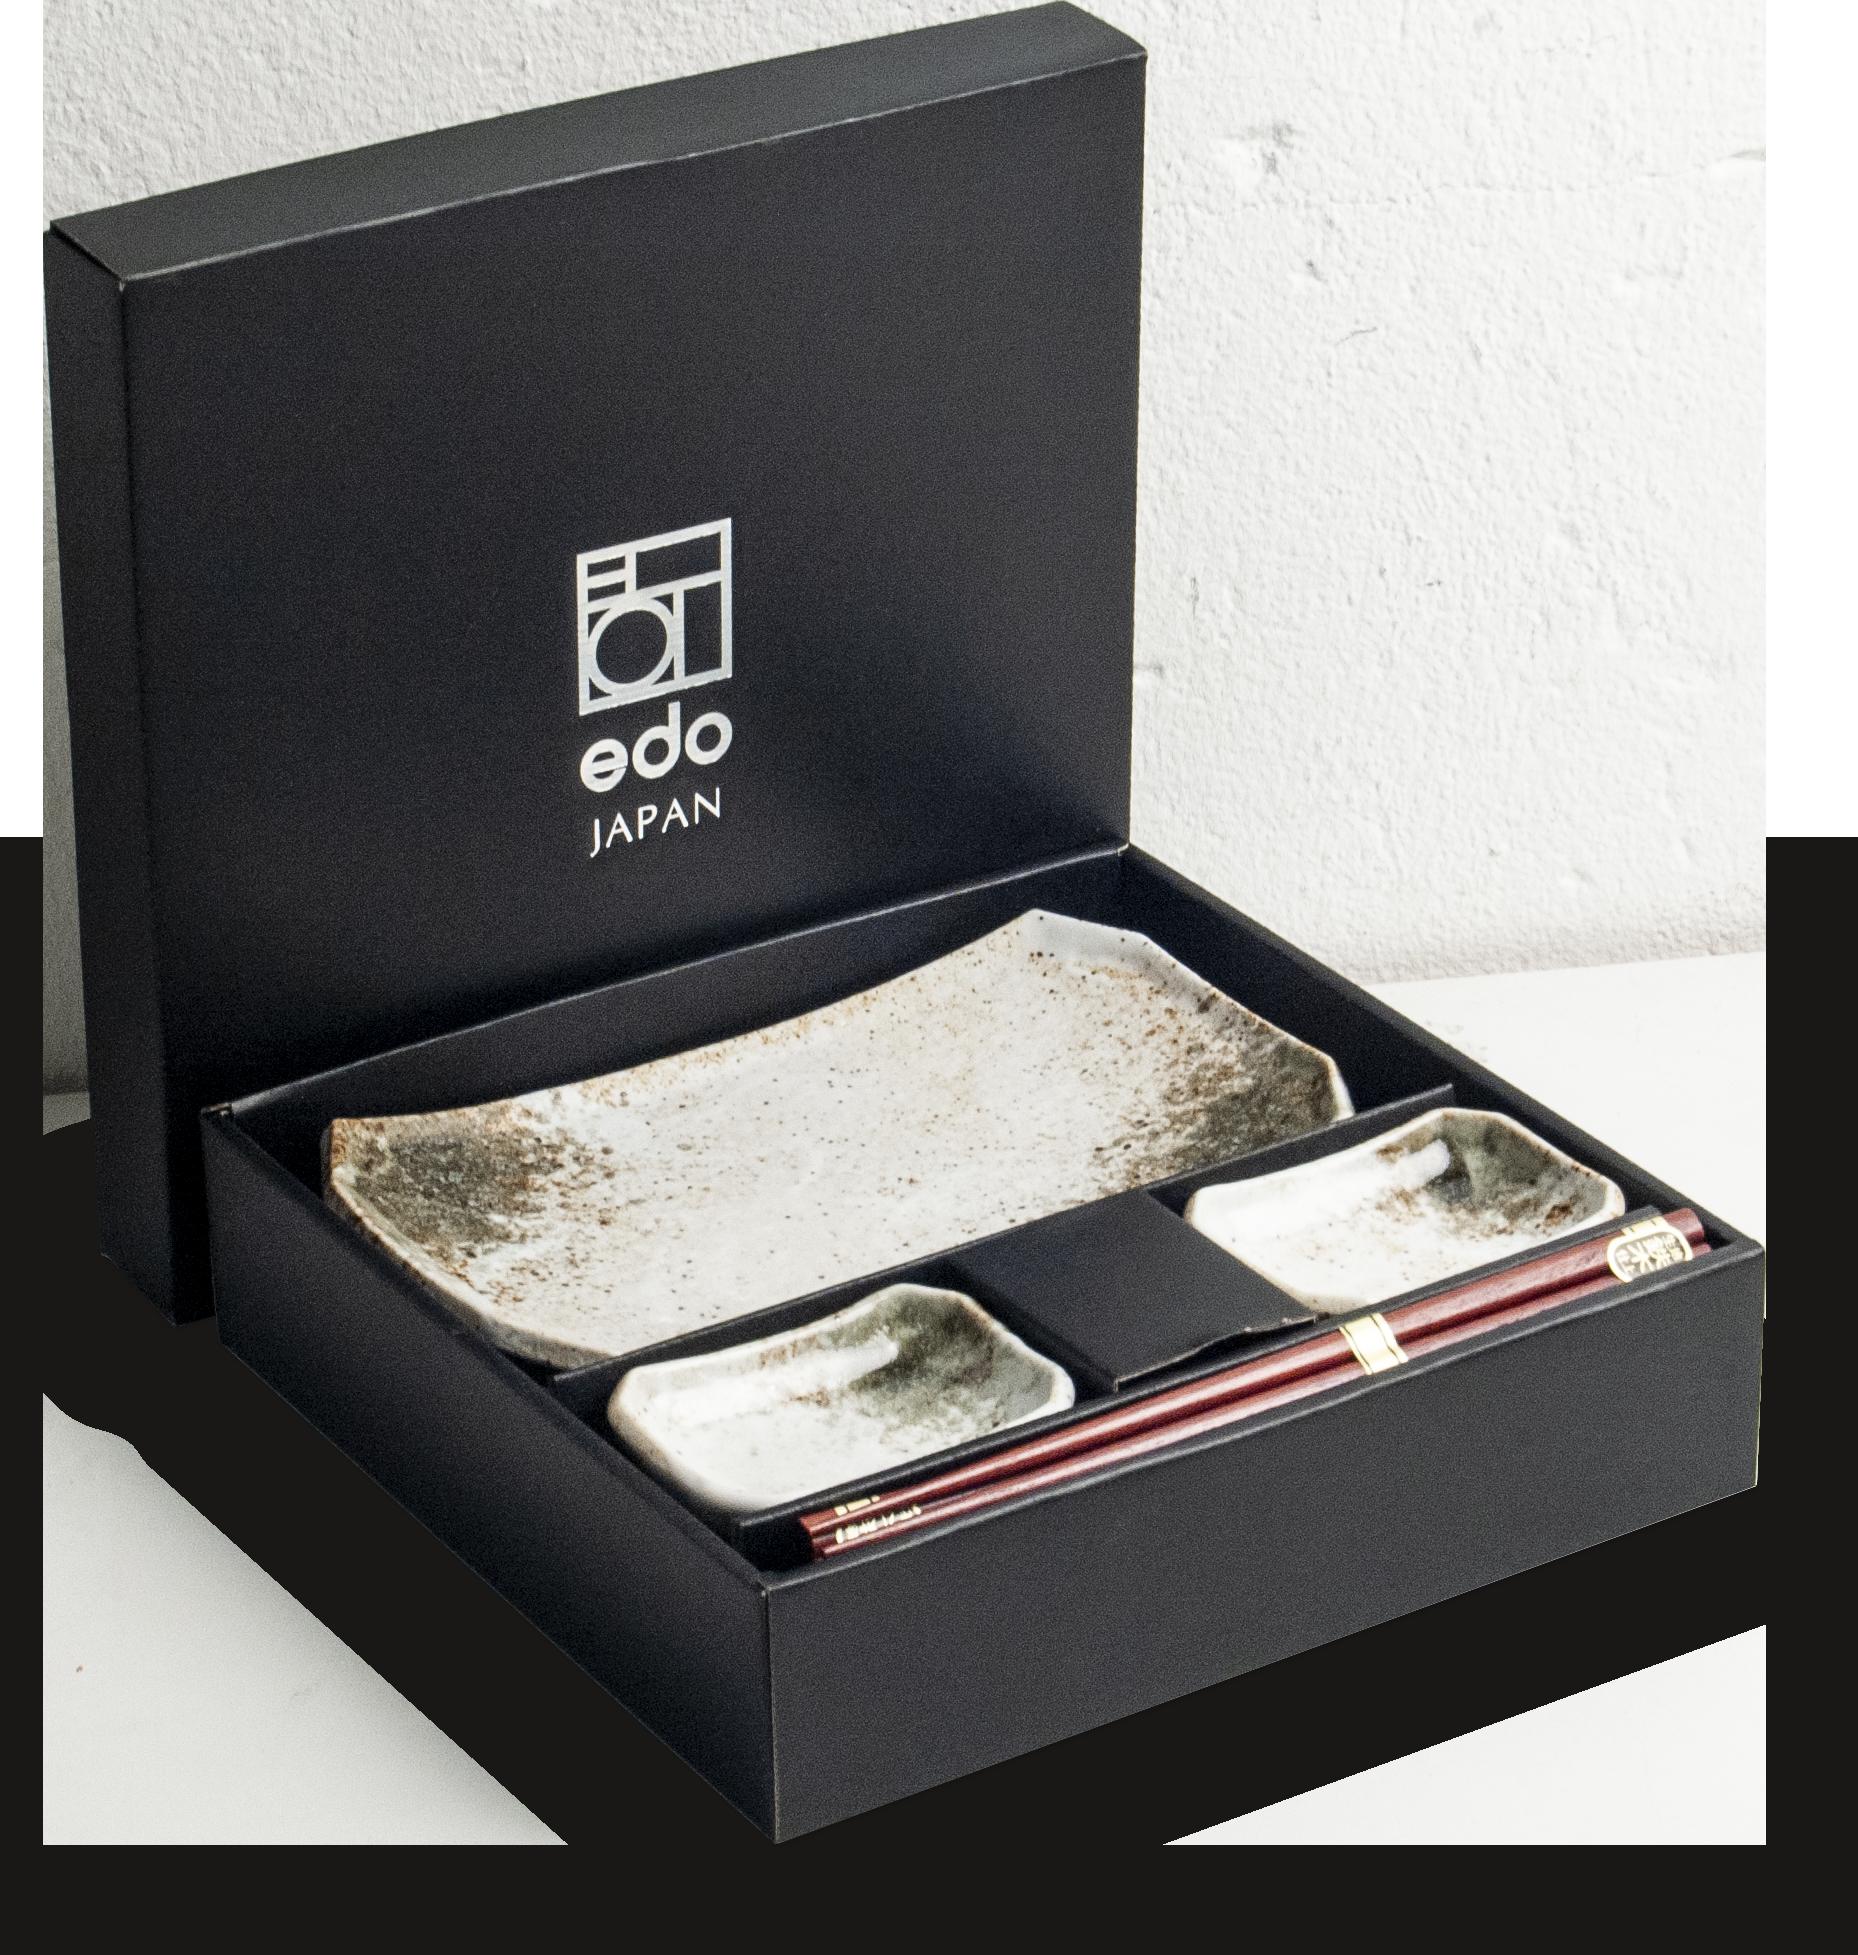 Edo Japan Coffret Service à Sushi Hikari de Edo Japan    6-pièces